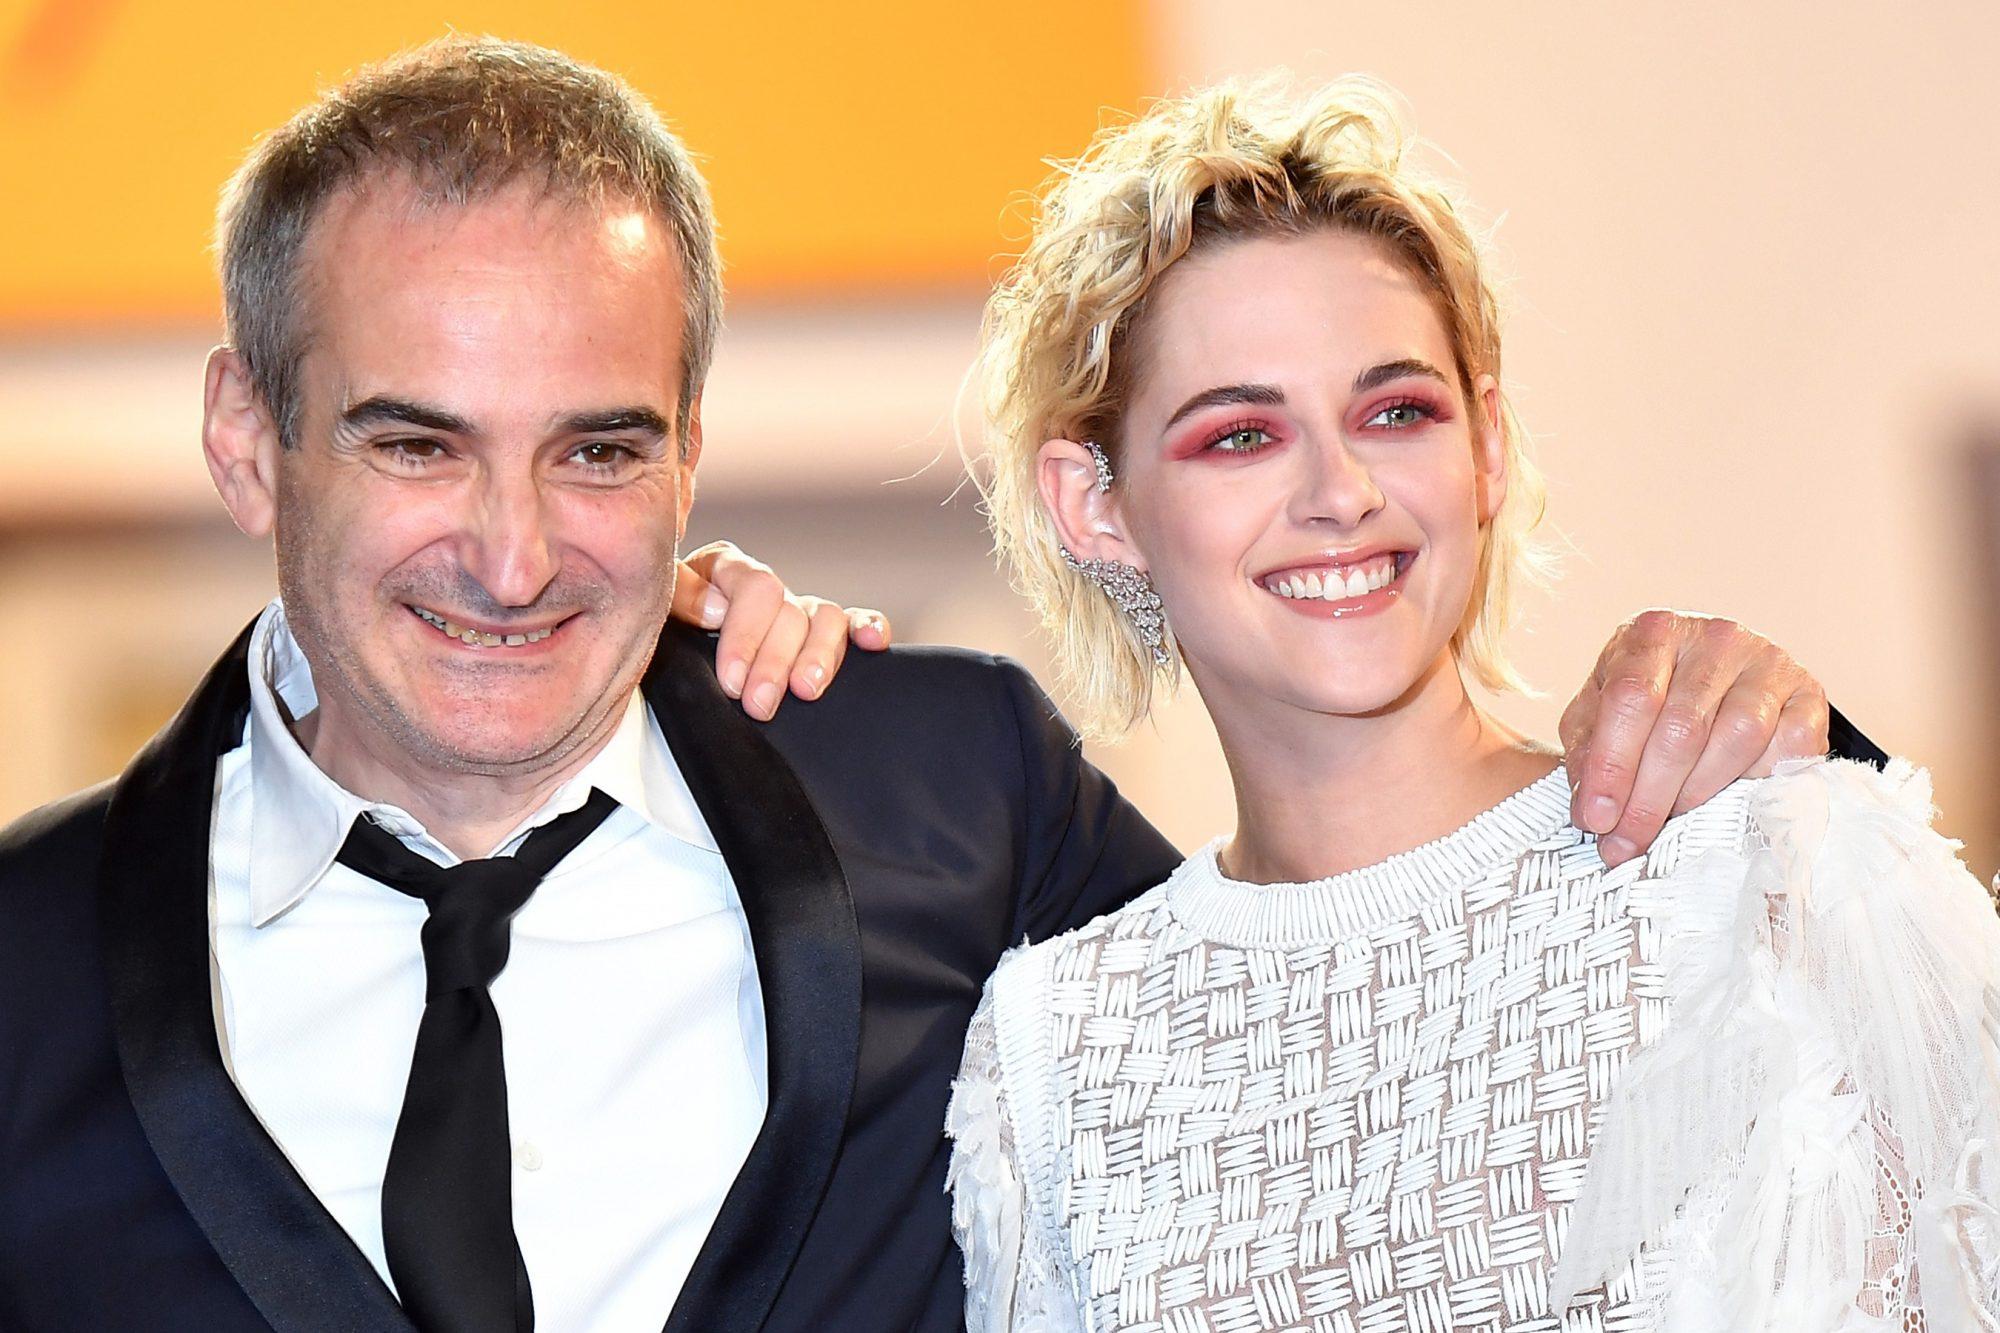 69th Cannes Film Festival - 'Personal Shopper' screening